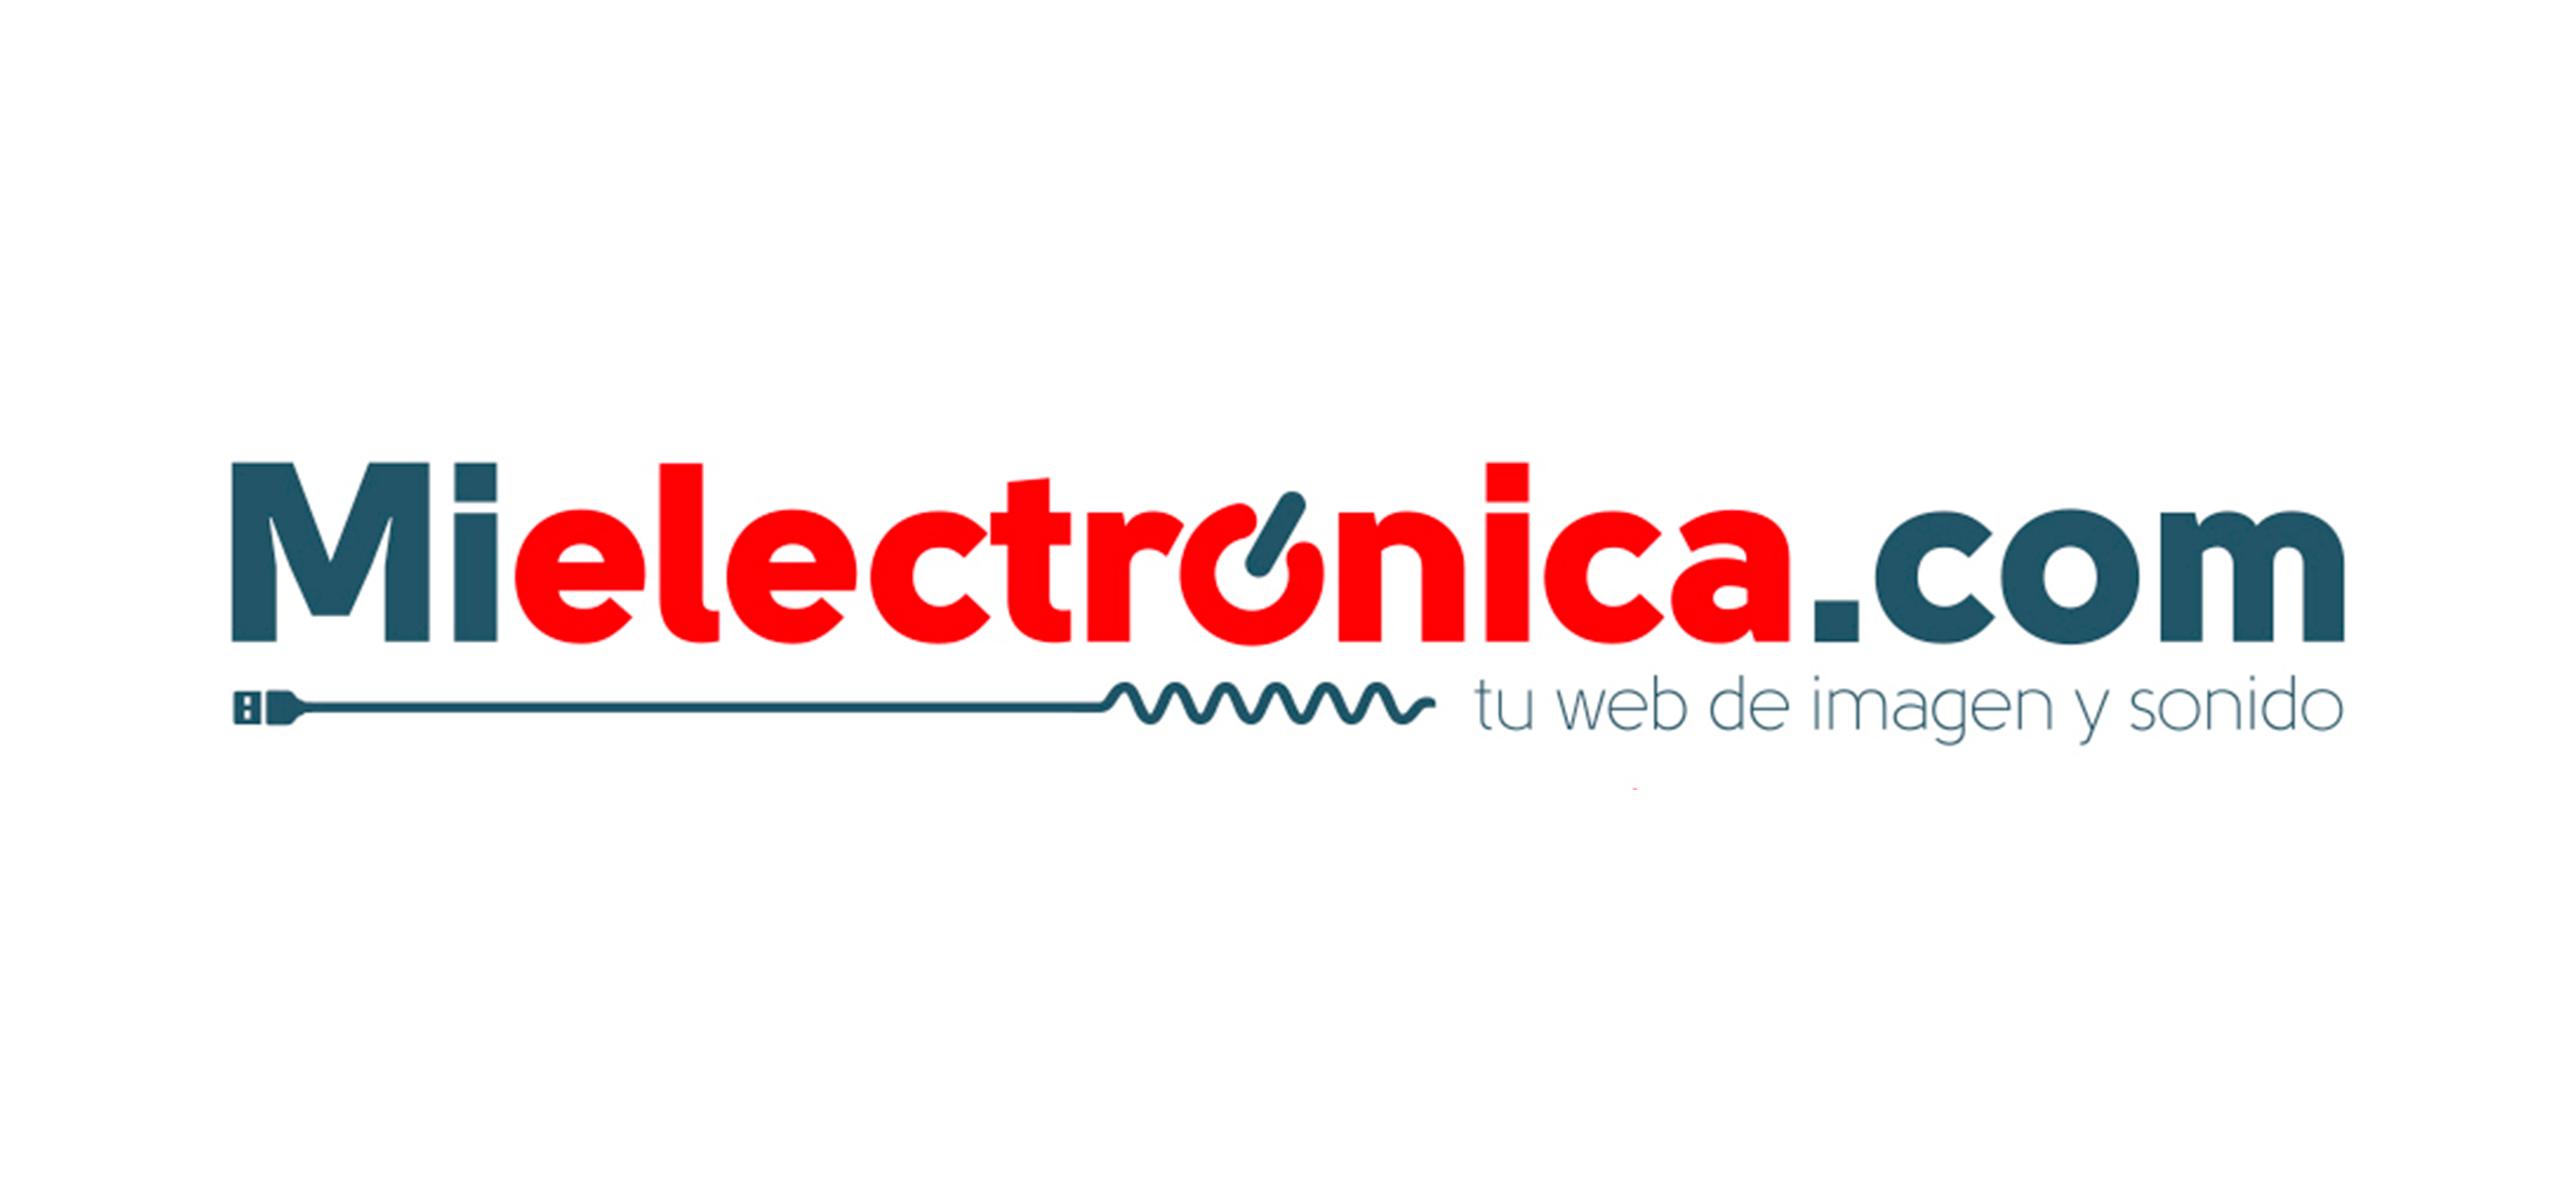 mielectronica - Portfolio